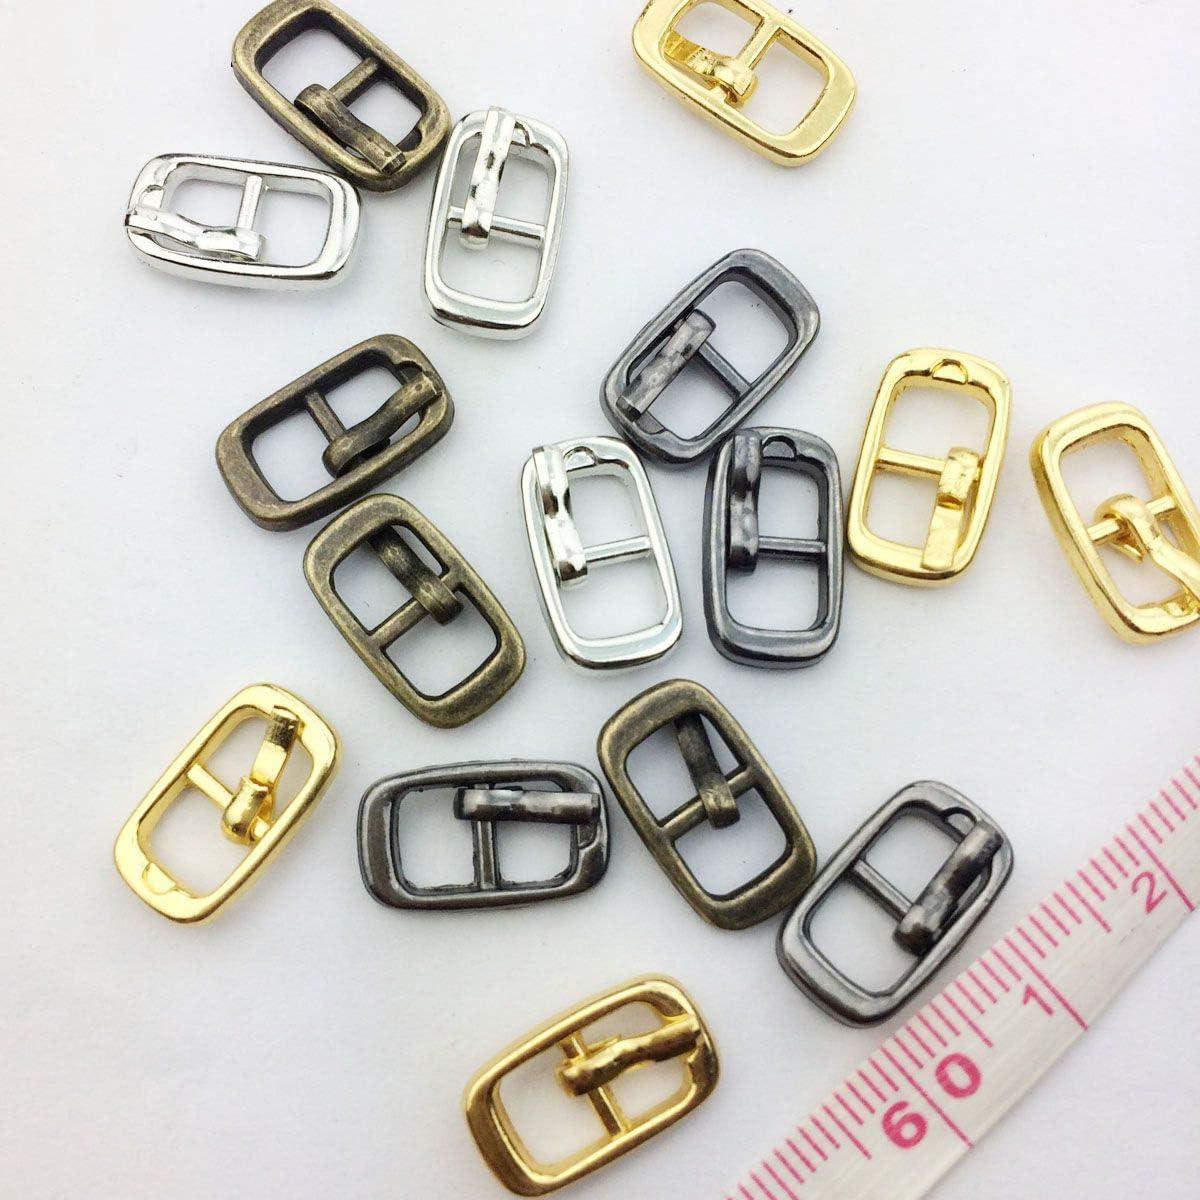 10pcs 4mm Diy buckle shoes accessories mini belt buckle for bjd blyth doll JB